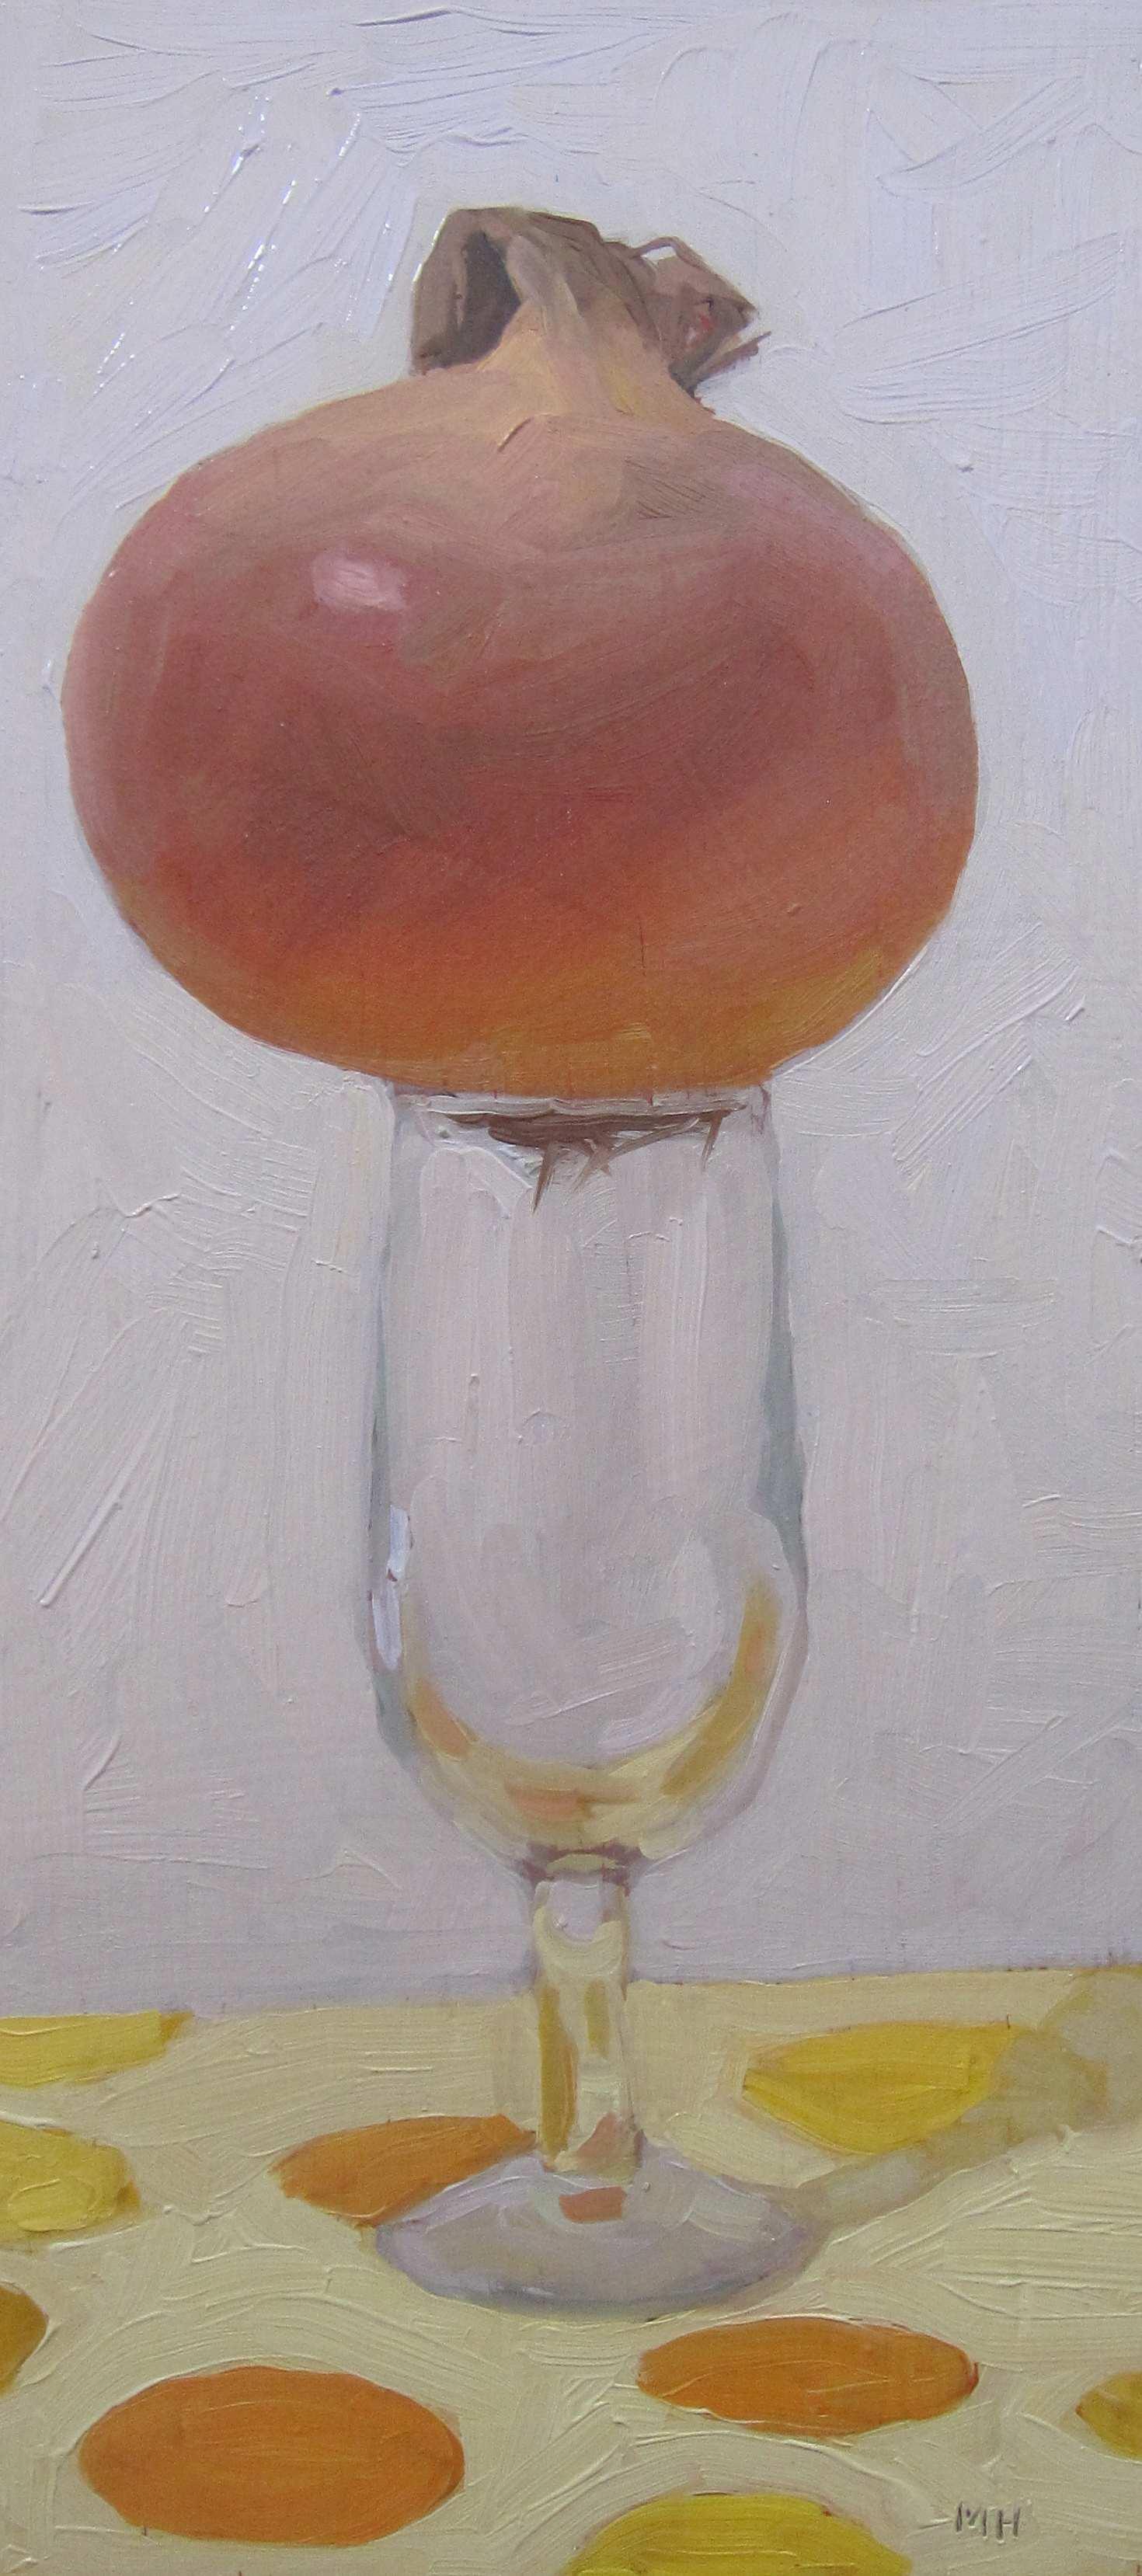 Onion (Cebolla) by  Melissa Hefferlin - Masterpiece Online